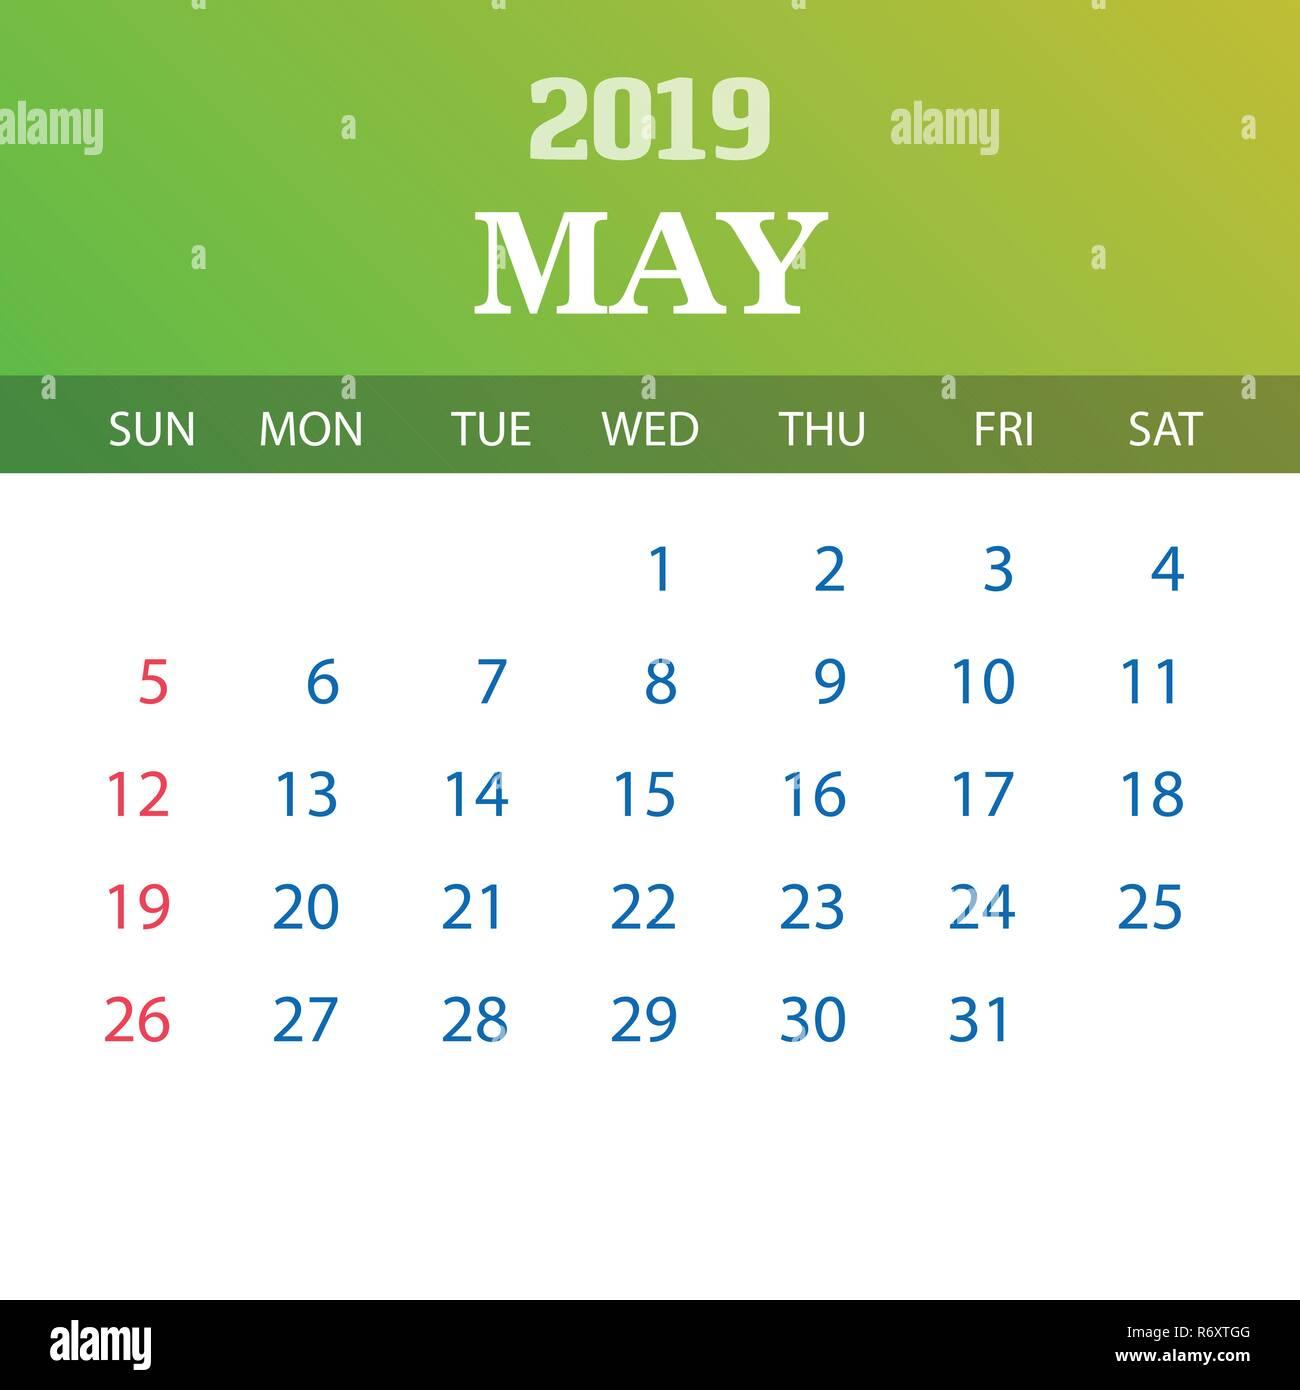 Mai Calendrier 2019.Modele De Calendrier 2019 Mai Vecteurs Et Illustration